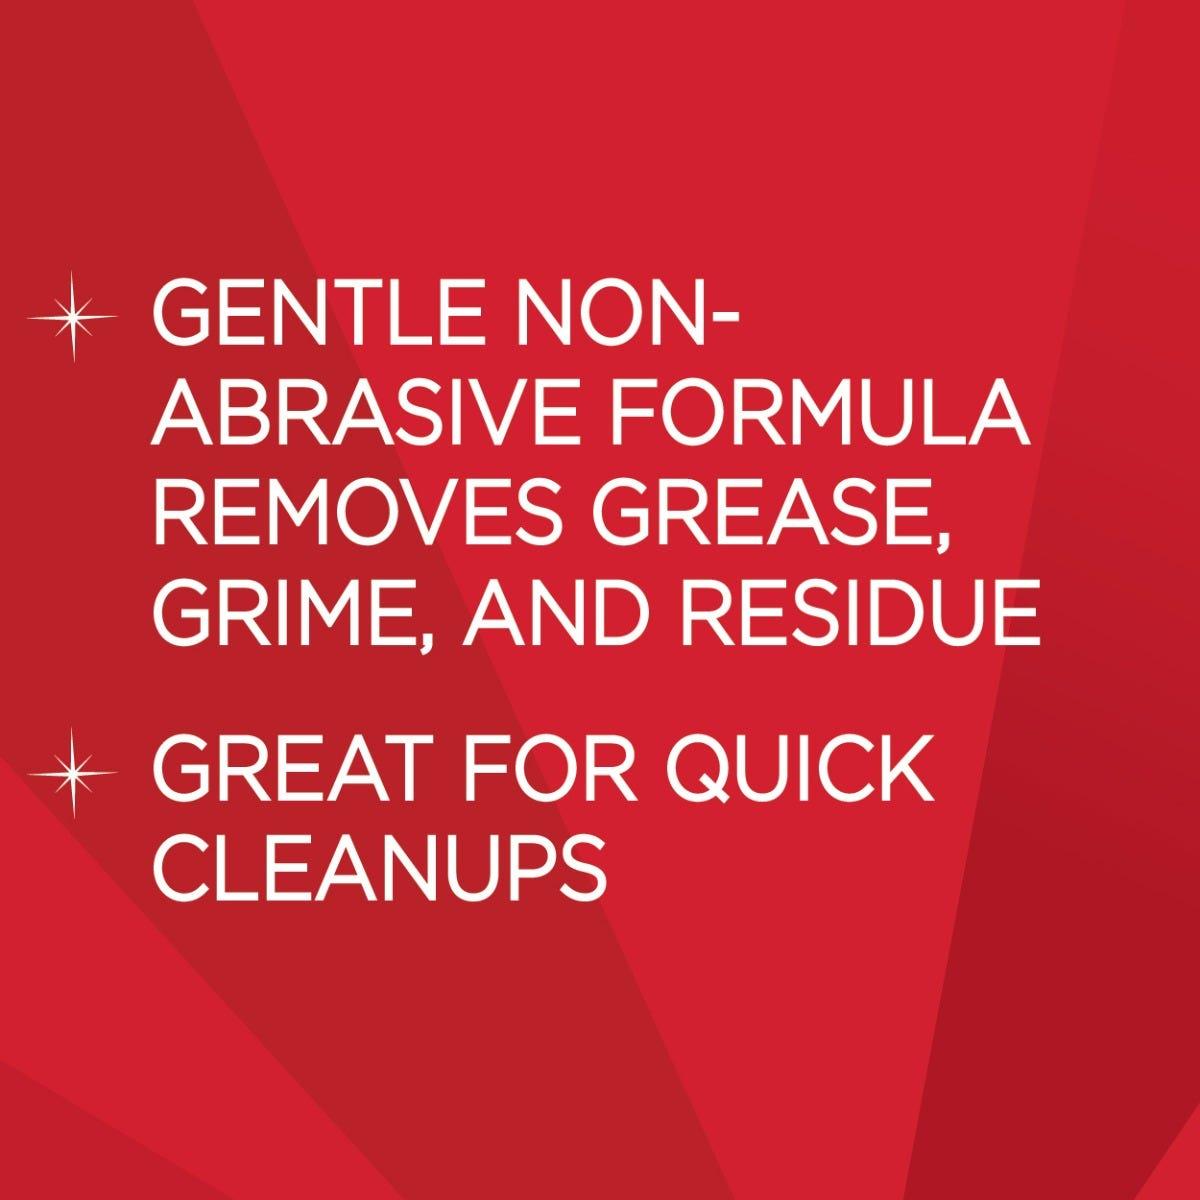 https://googone.com/media/catalog/product/g/l/glass_cooktop_daily_cleaner_benefits_1.jpg